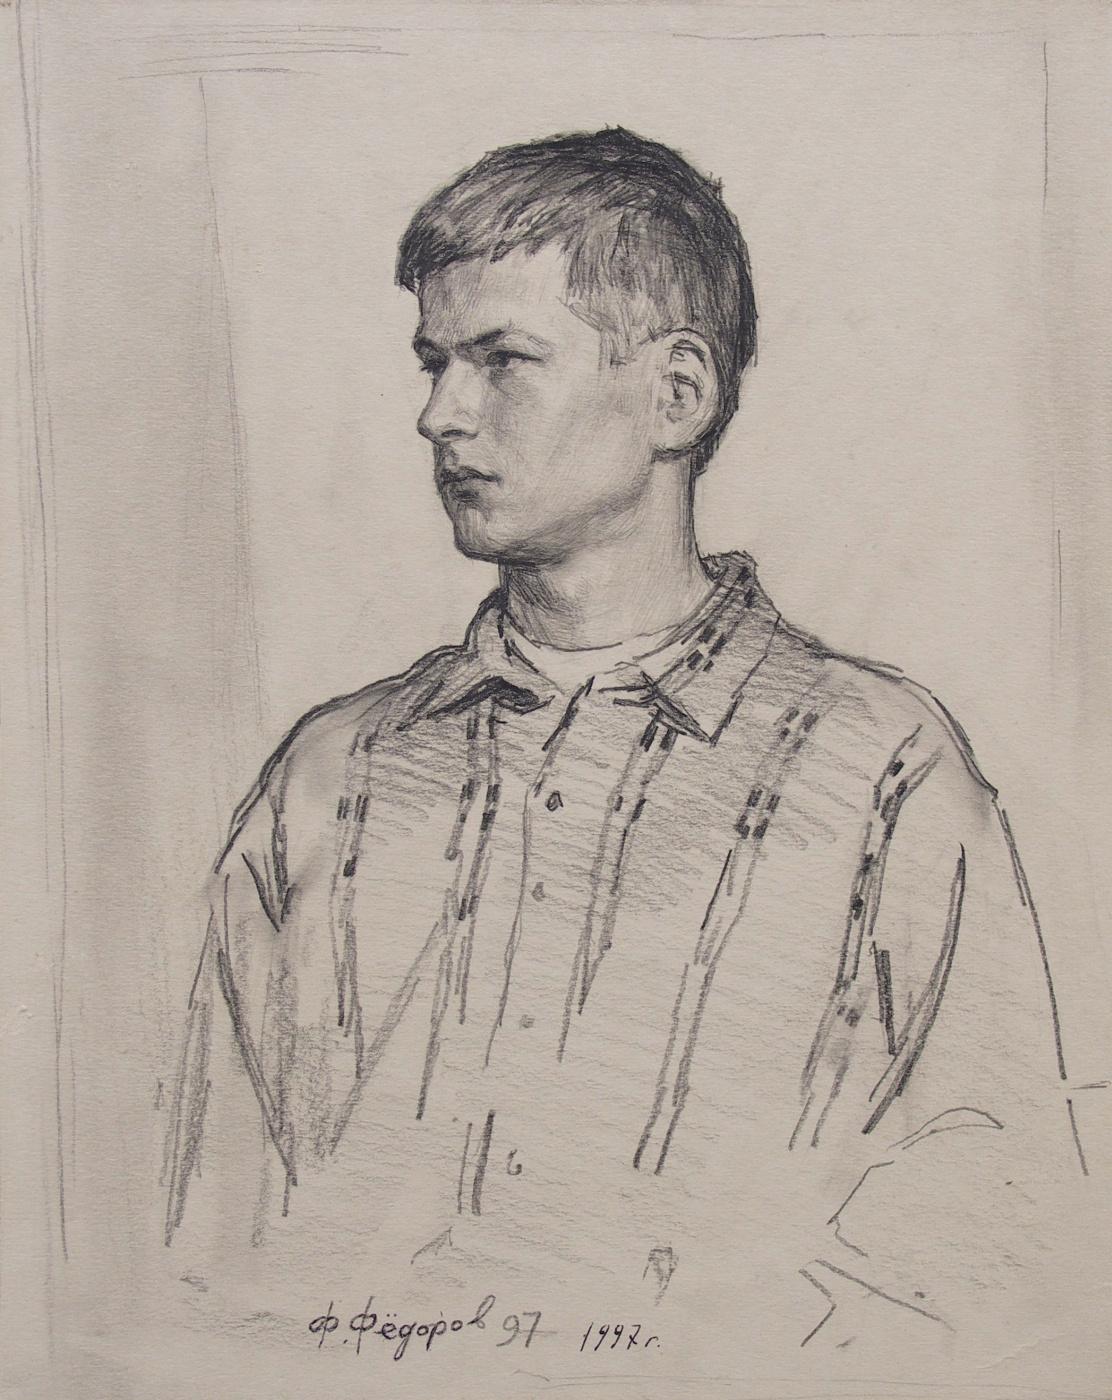 Фёдор Борисович Фёдоров. Alexey Romanov, student of the St. Petersburg Art College named after N.K. Roerich